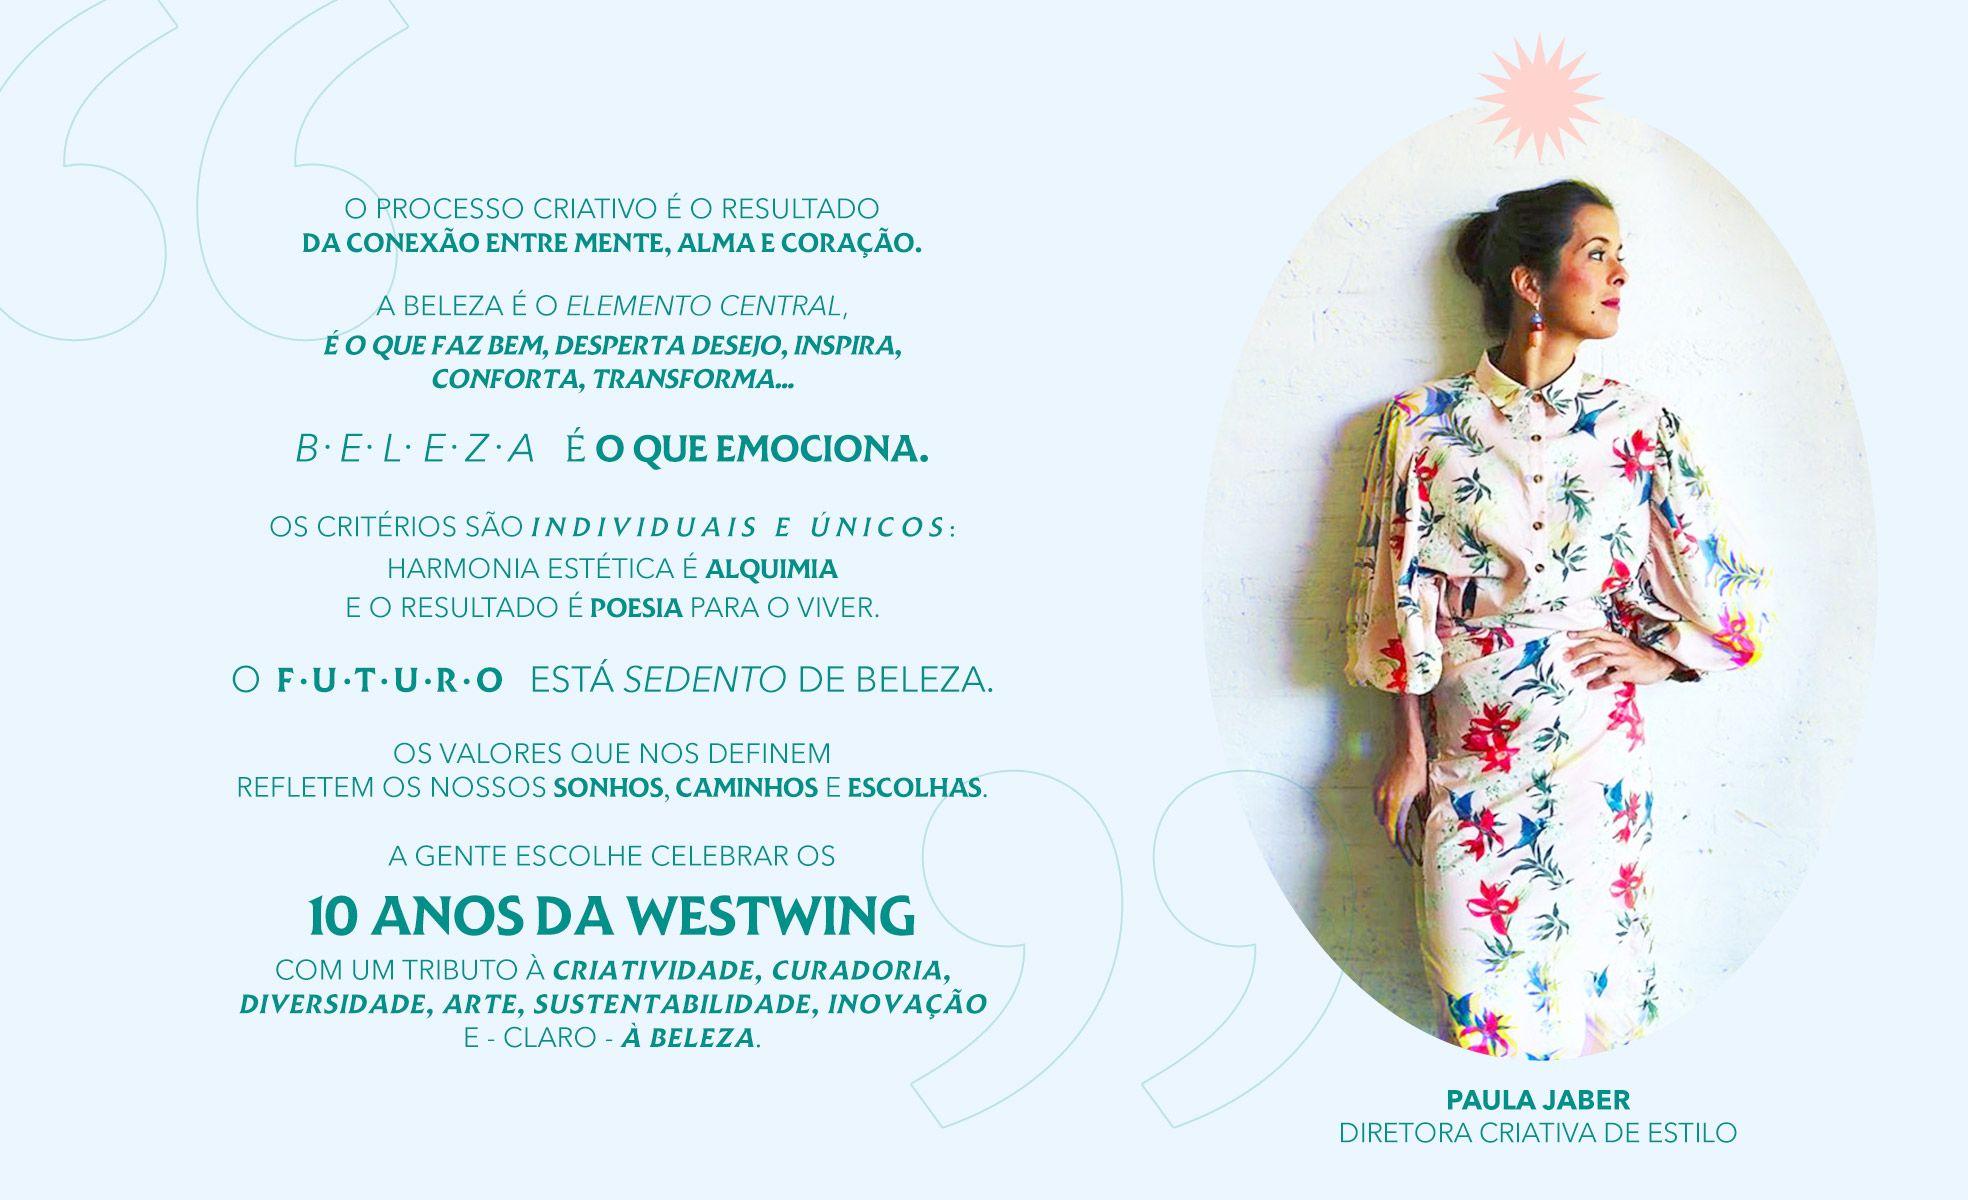 Para celebrar: 10 anos de Westwing! | Foto 2 | Westwing.com.br